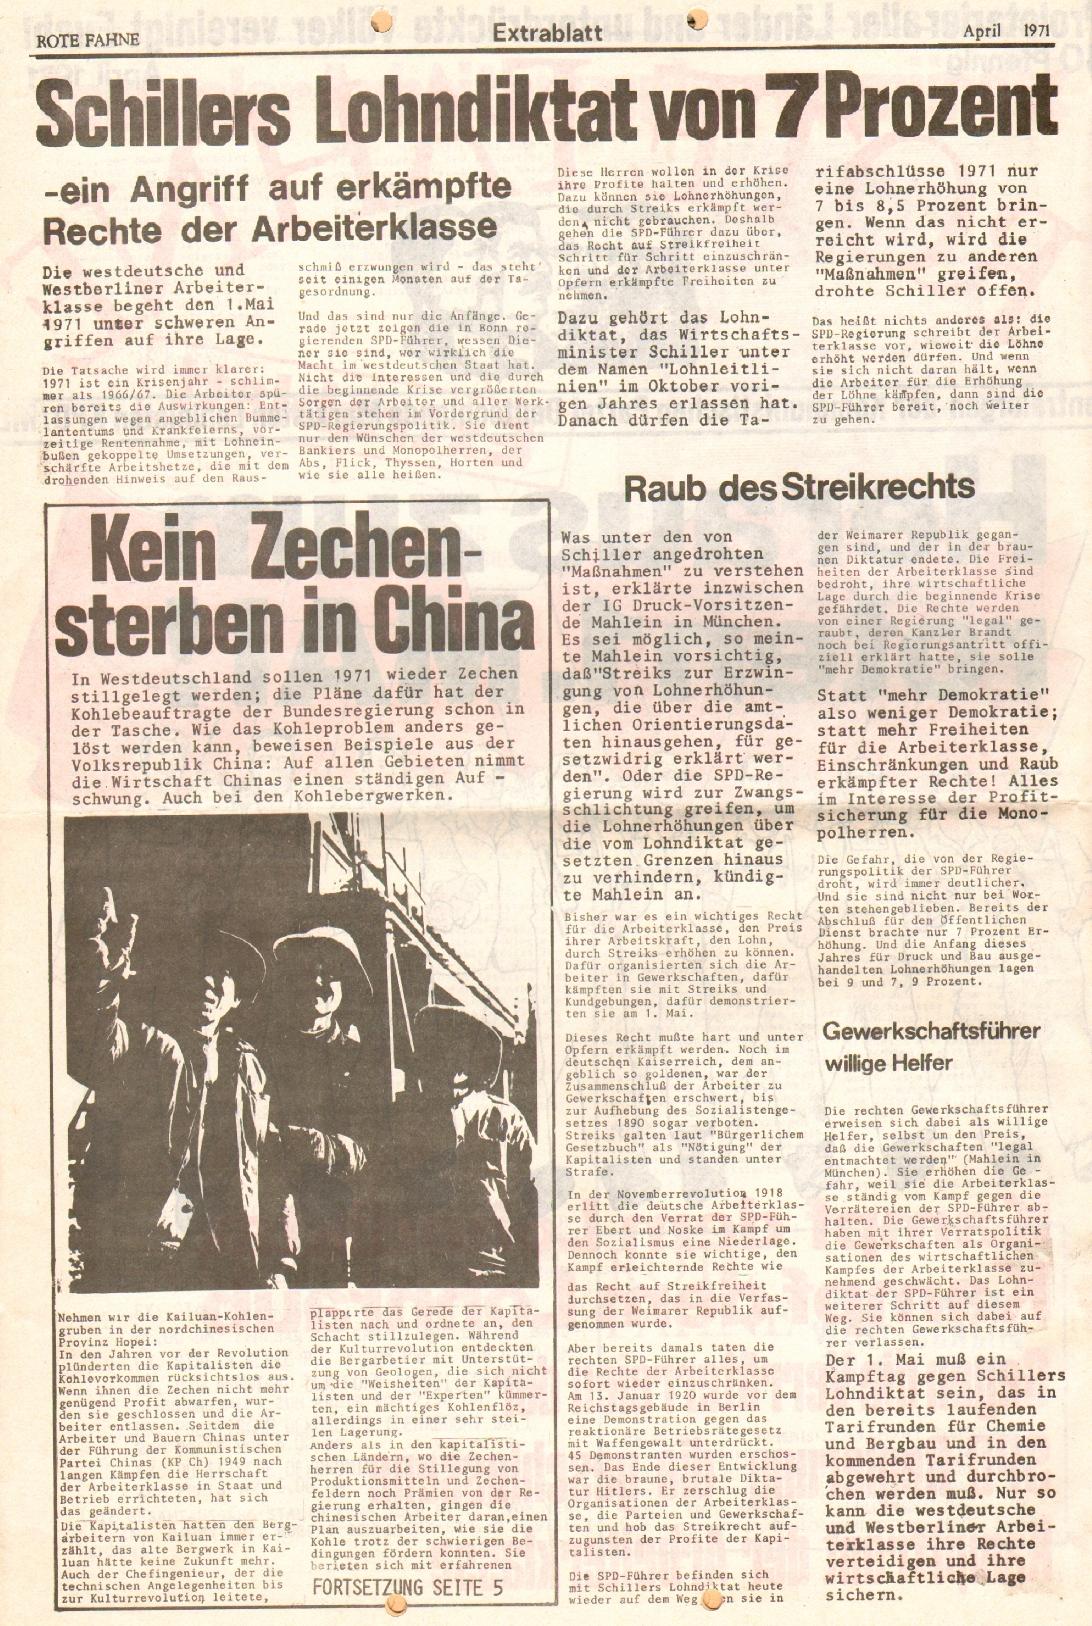 Rote Fahne, 2. Jg., April 1971, Extrablatt, Seite 2